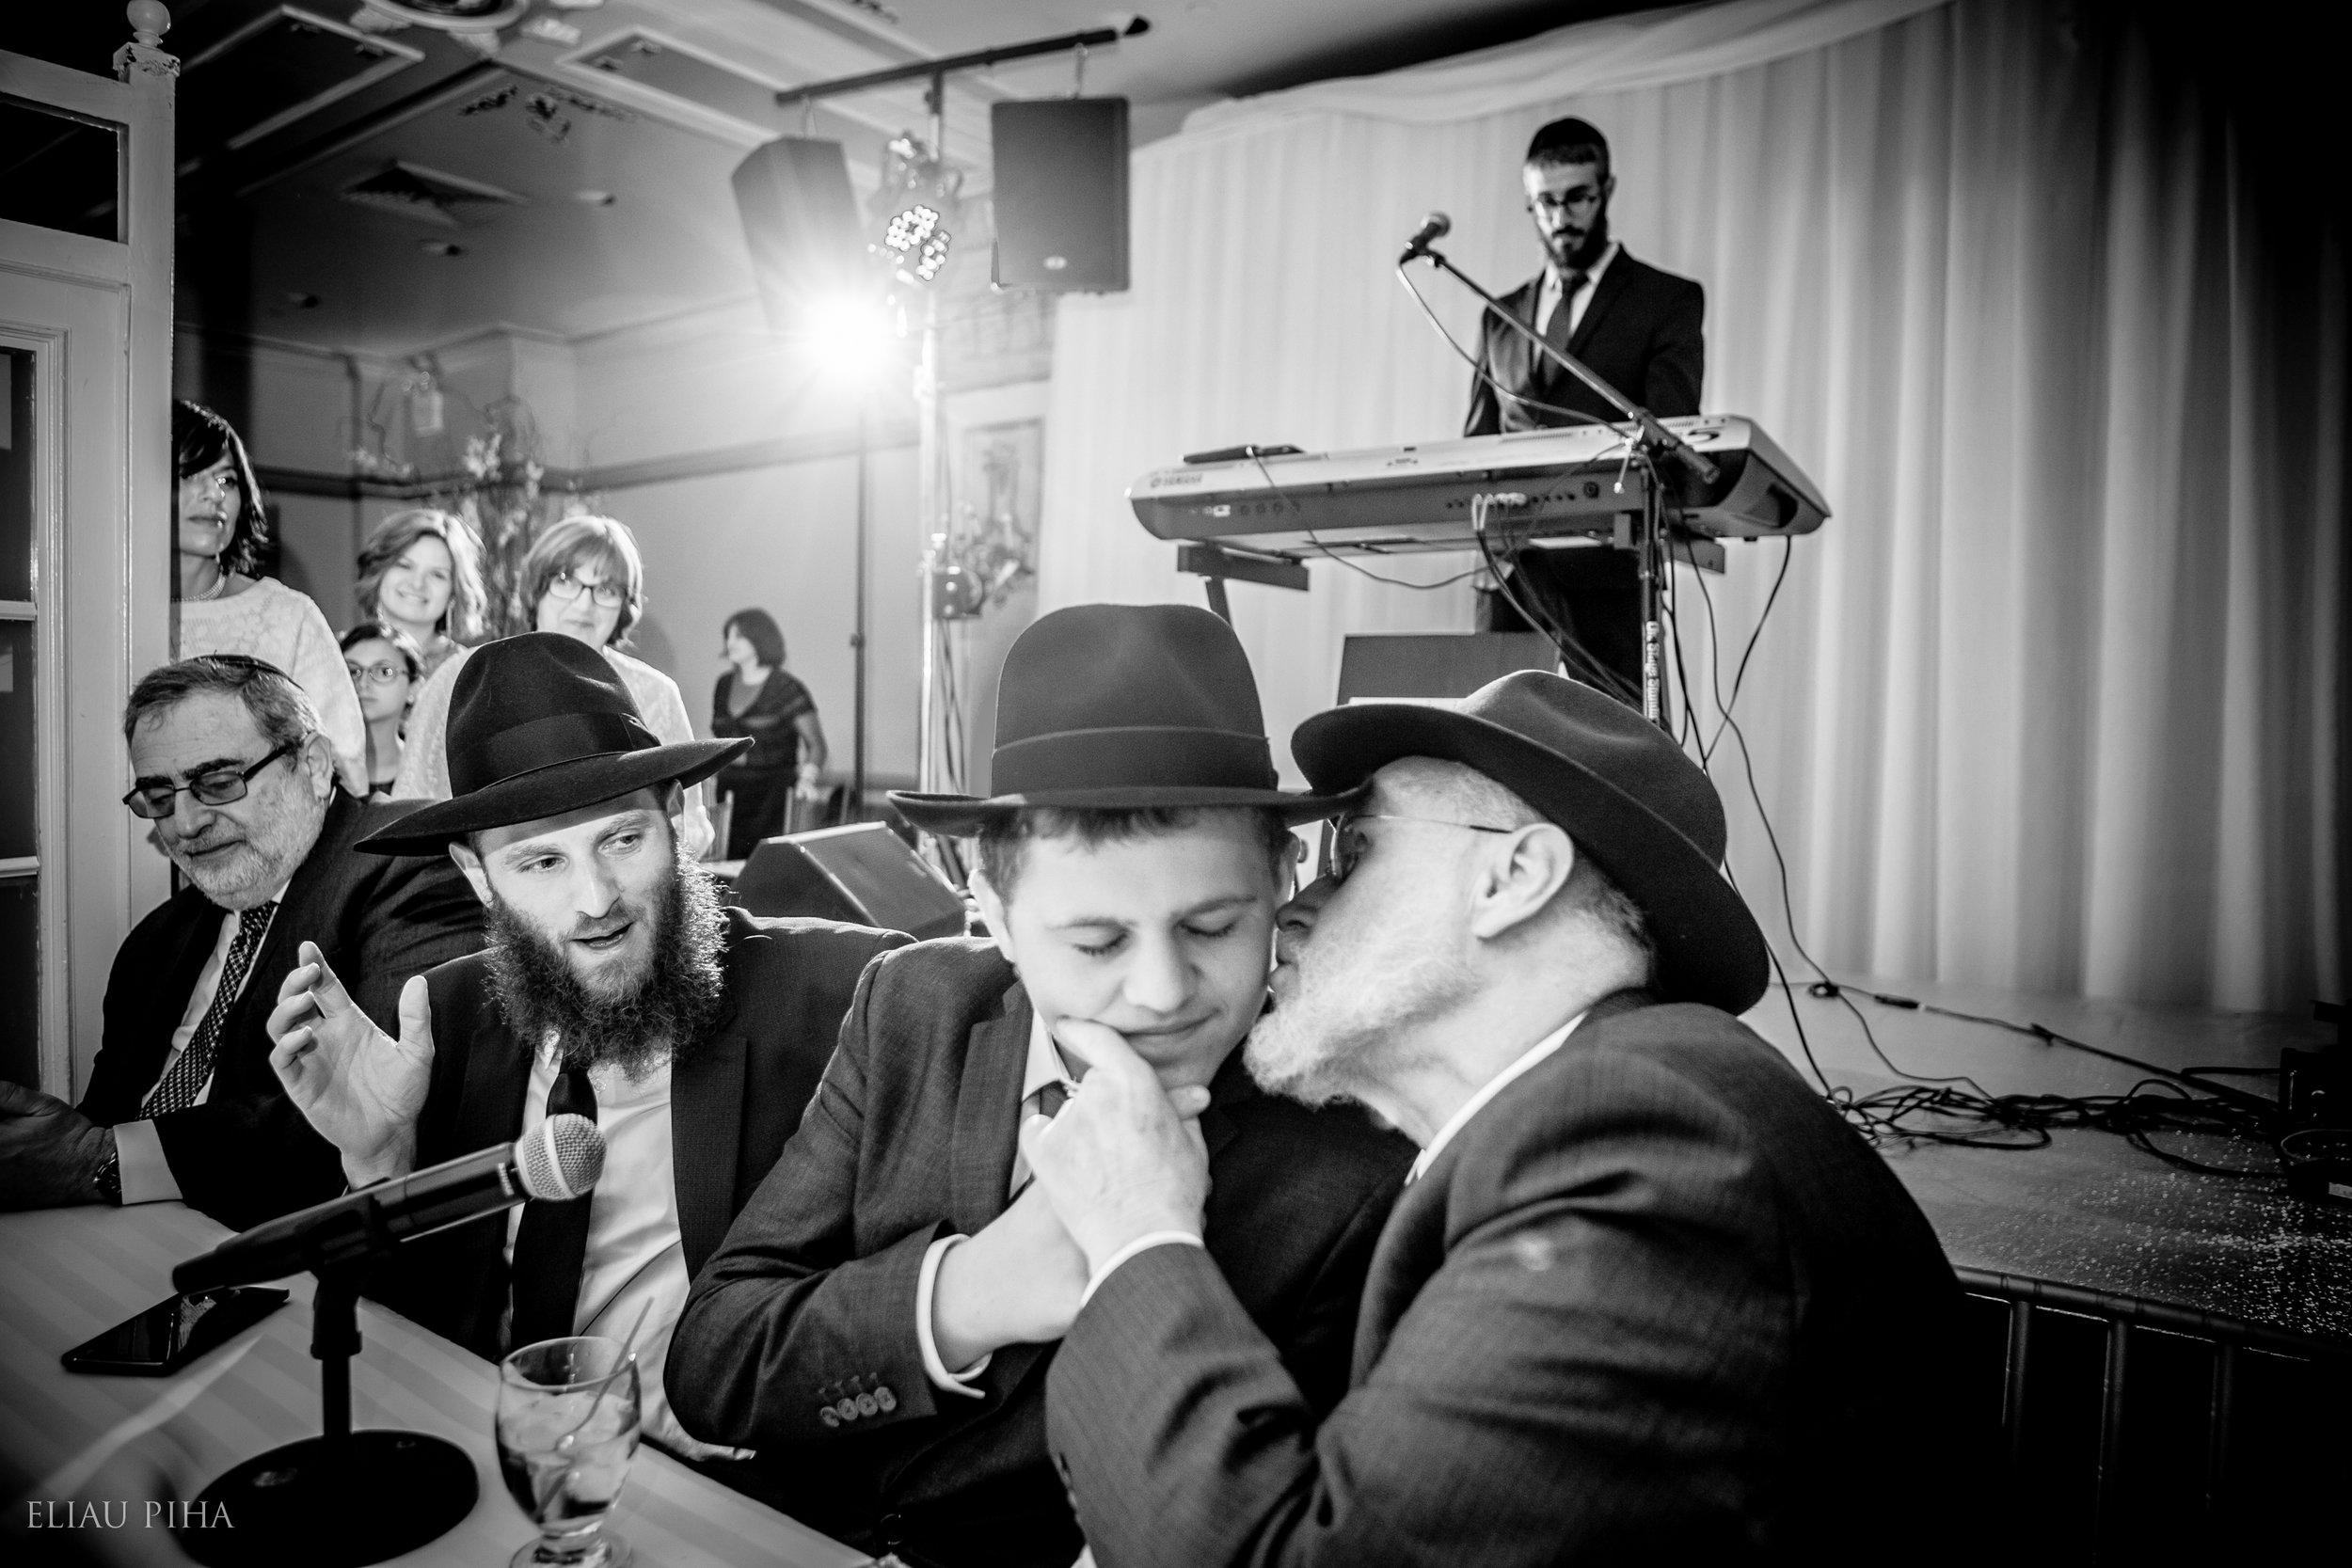 Bar Mitzvah Meir Sandman - photography, new york, events, people -0347.jpg